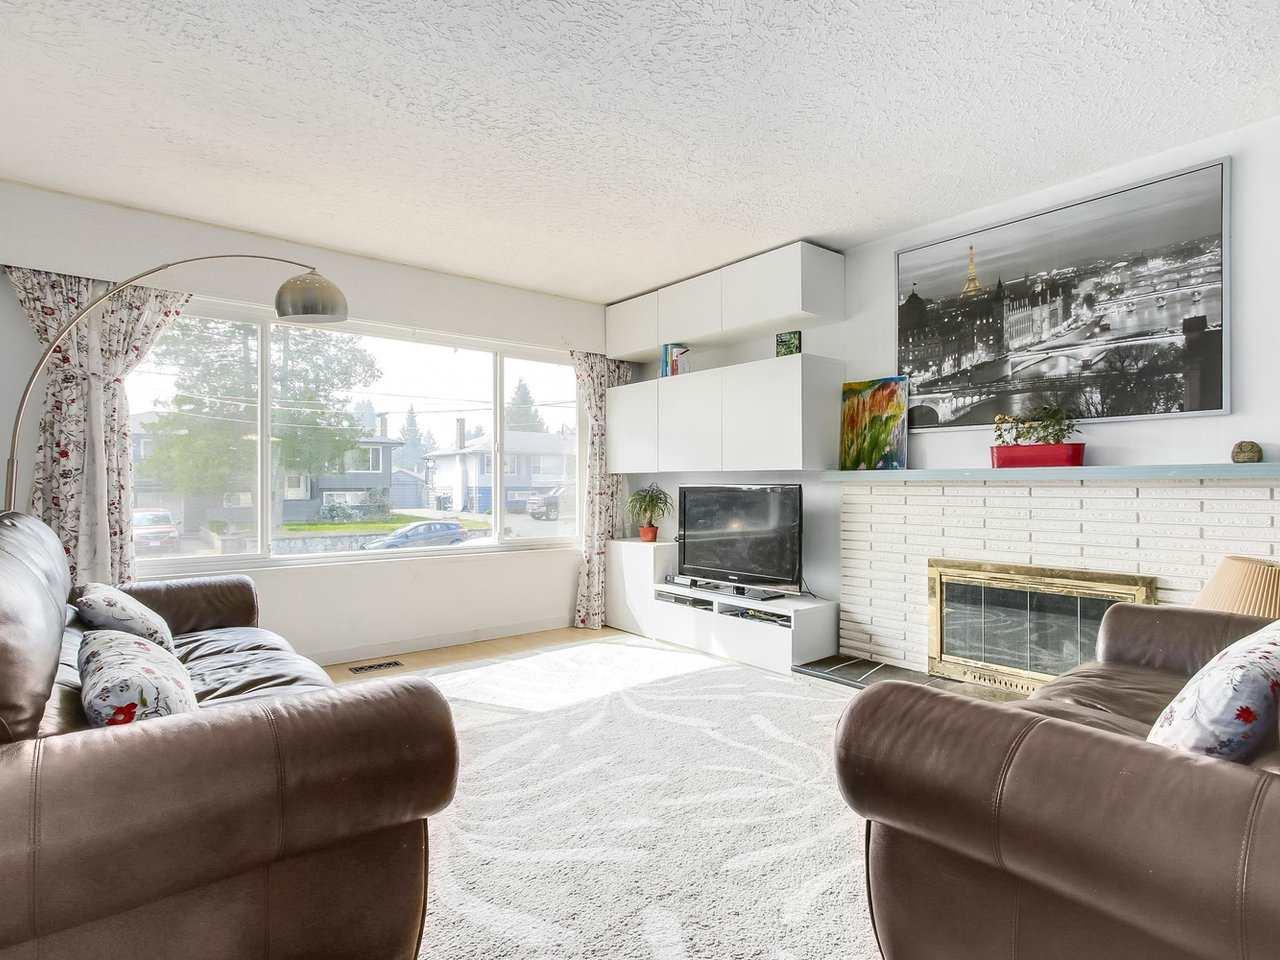 Detached at 703 WILMOT STREET, Coquitlam, British Columbia. Image 3